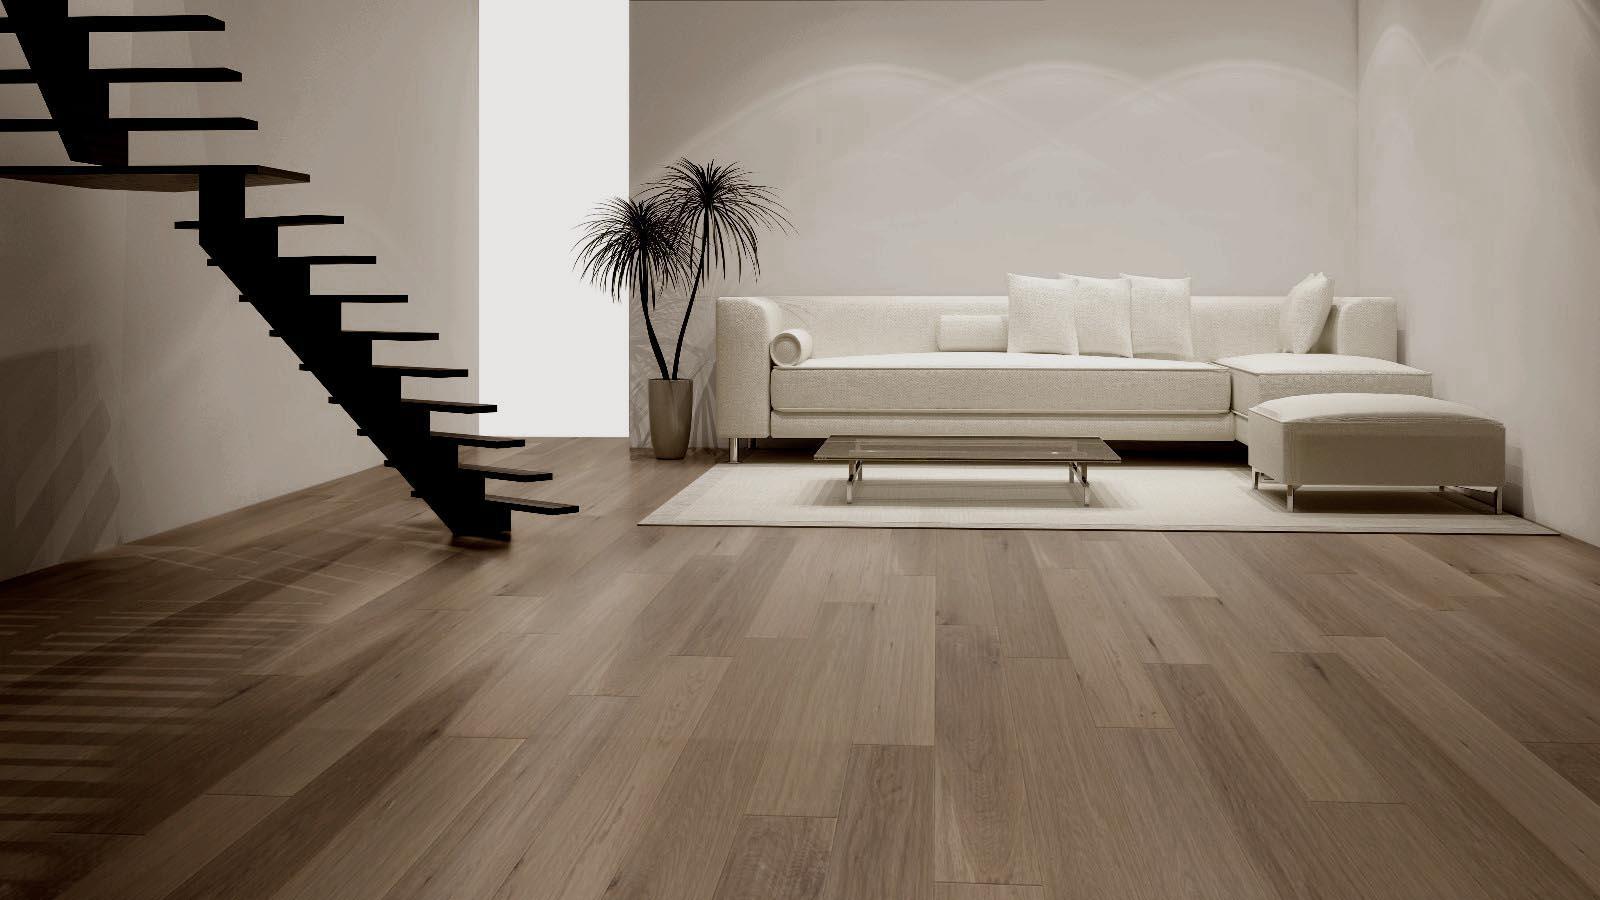 mohawk hardwood floor cleaner reviews of mohawk amber 9 wide glue down luxury vinyl plank flooring in mohawk amber 9 wide glue down luxury vinyl plank flooring room